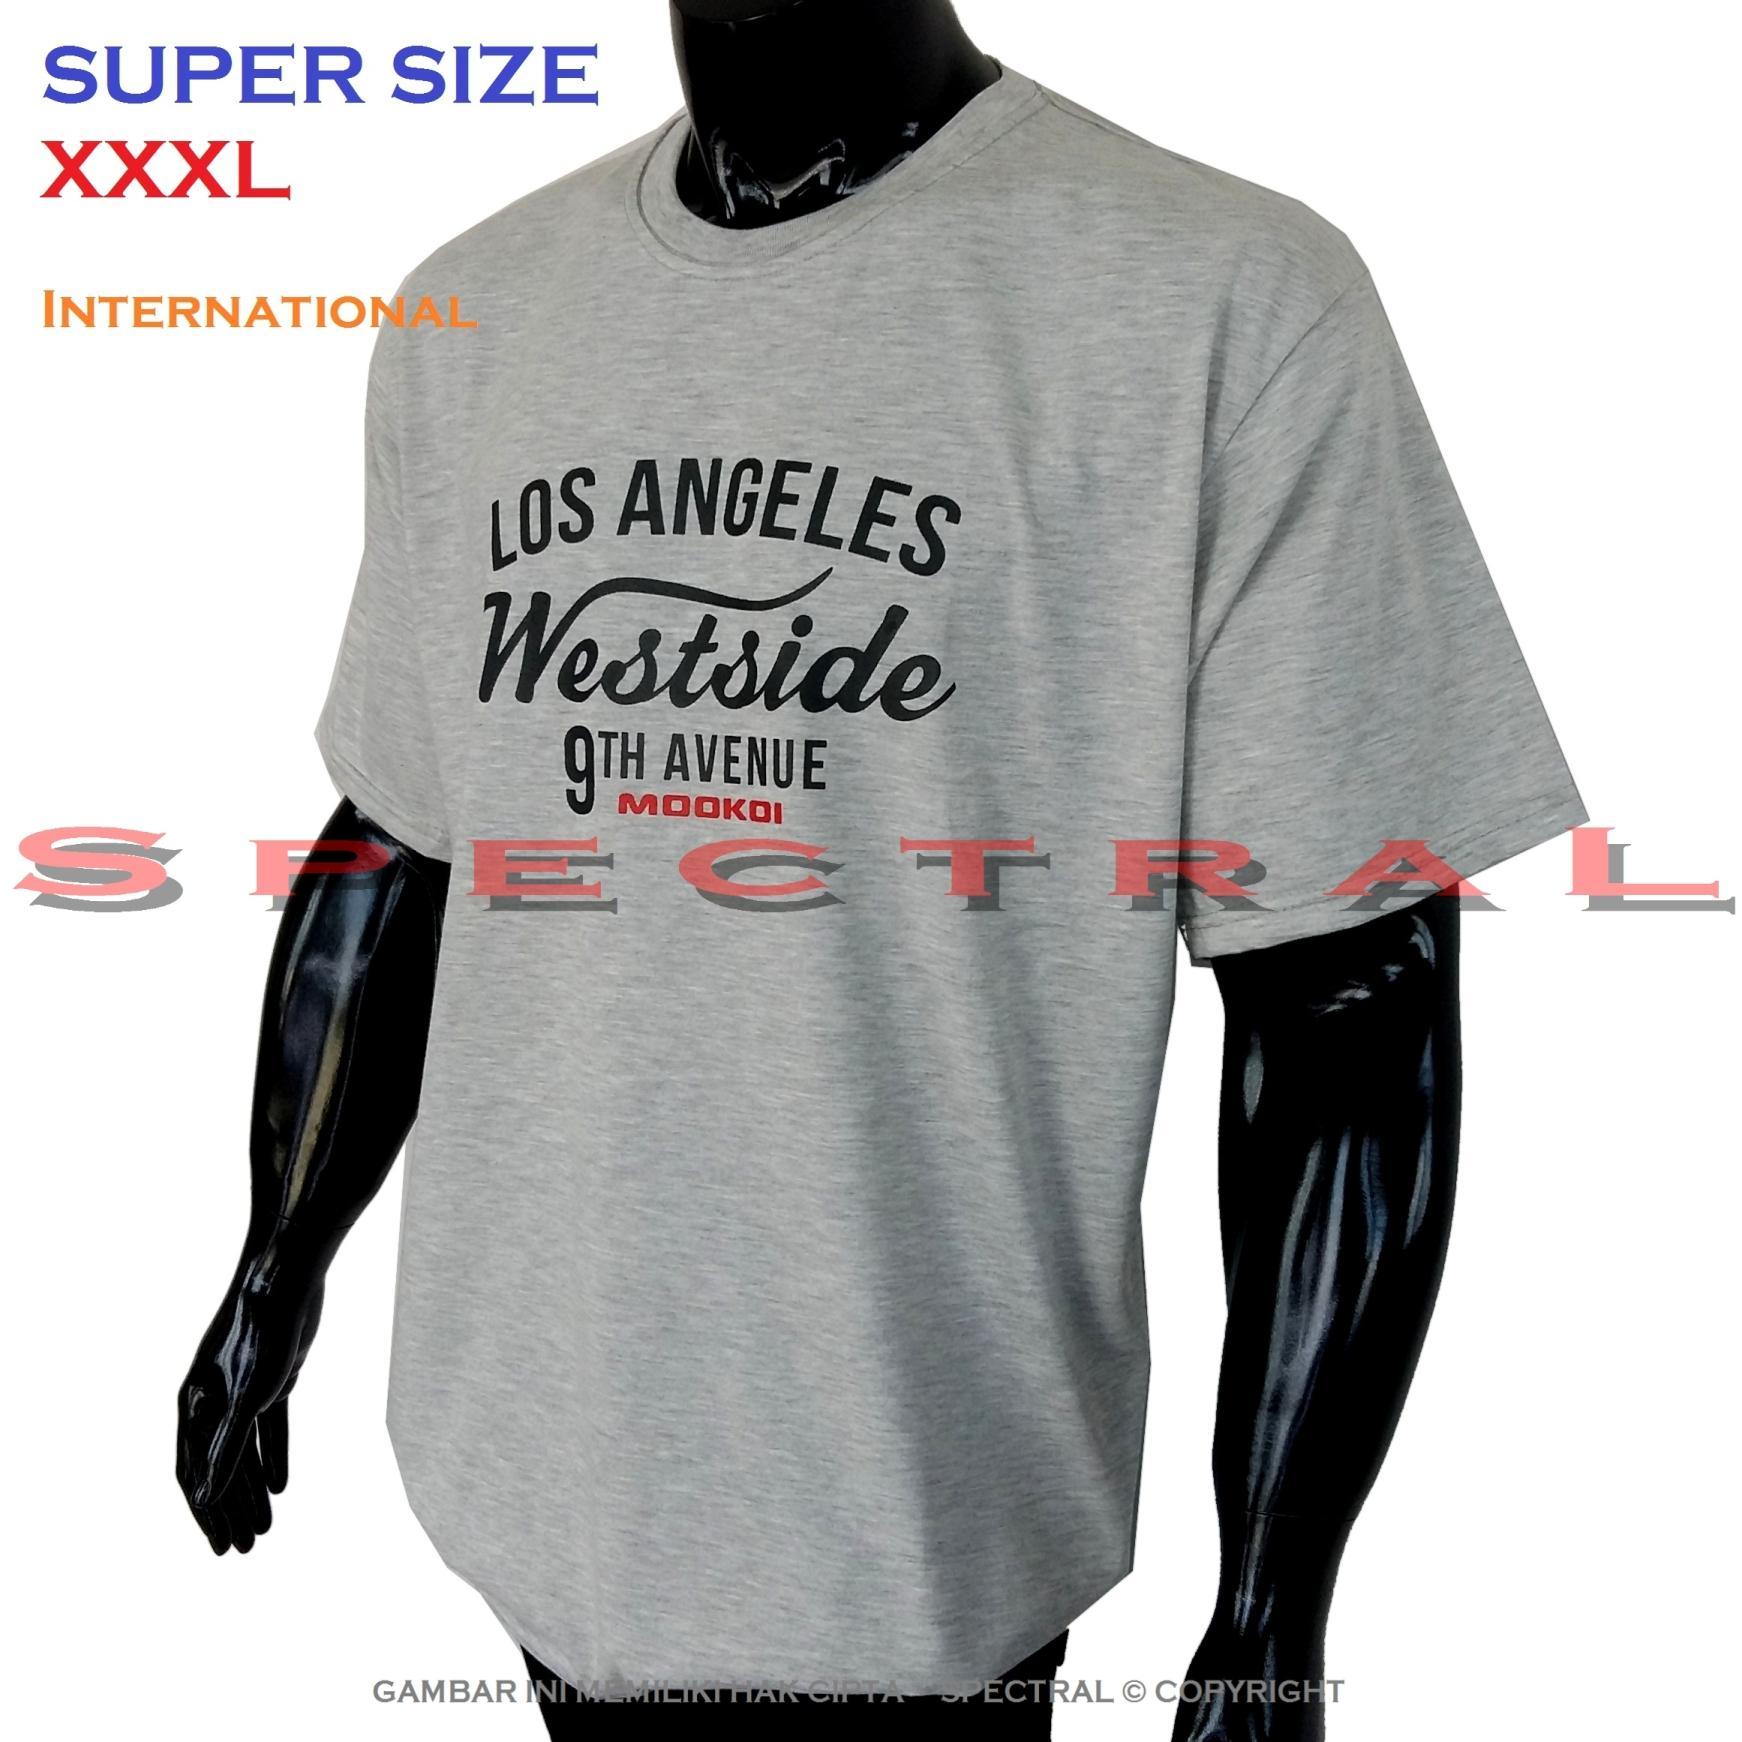 Spectral – SUPER BIG SIZE XXXL INTERNATIONAL 100% Soft Cotton Combed Kaos Distro Jumbo BIGSIZE T-Shirt Fashion Ukuran Besar Polos Celana Atasan Pria Wanita Katun Bapak Orang Tua Gemuk Gendut Lengan Simple Sport Casual 3L 3XL Baju Cowo Cewe Pakaian Terbaru